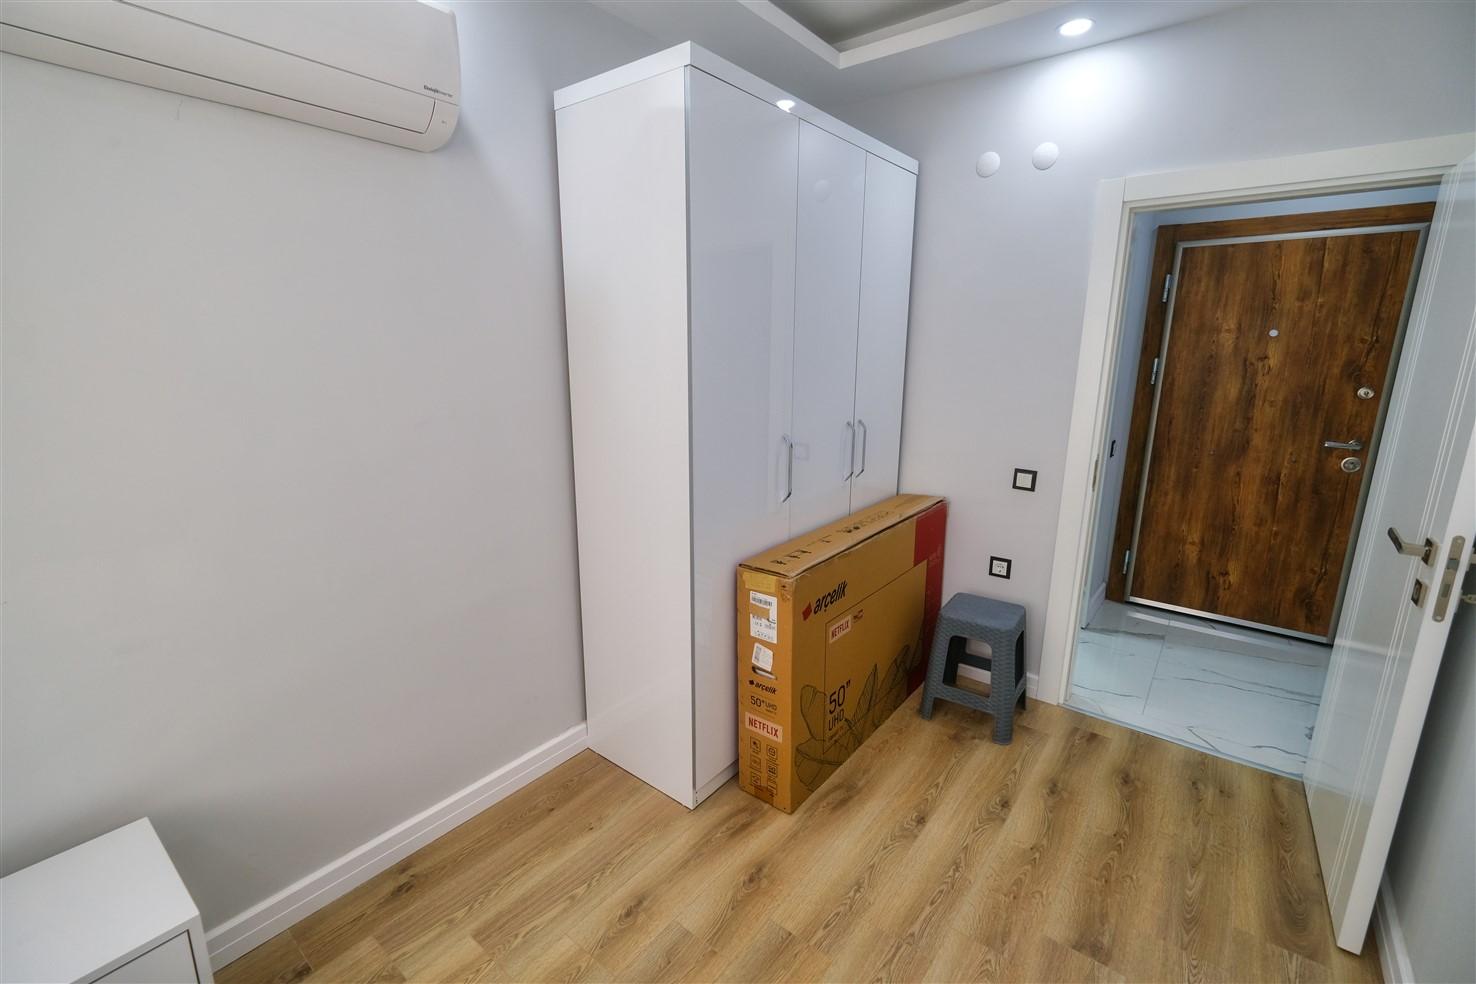 Трёхкомнатная квартира в центре Антальи - Фото 31